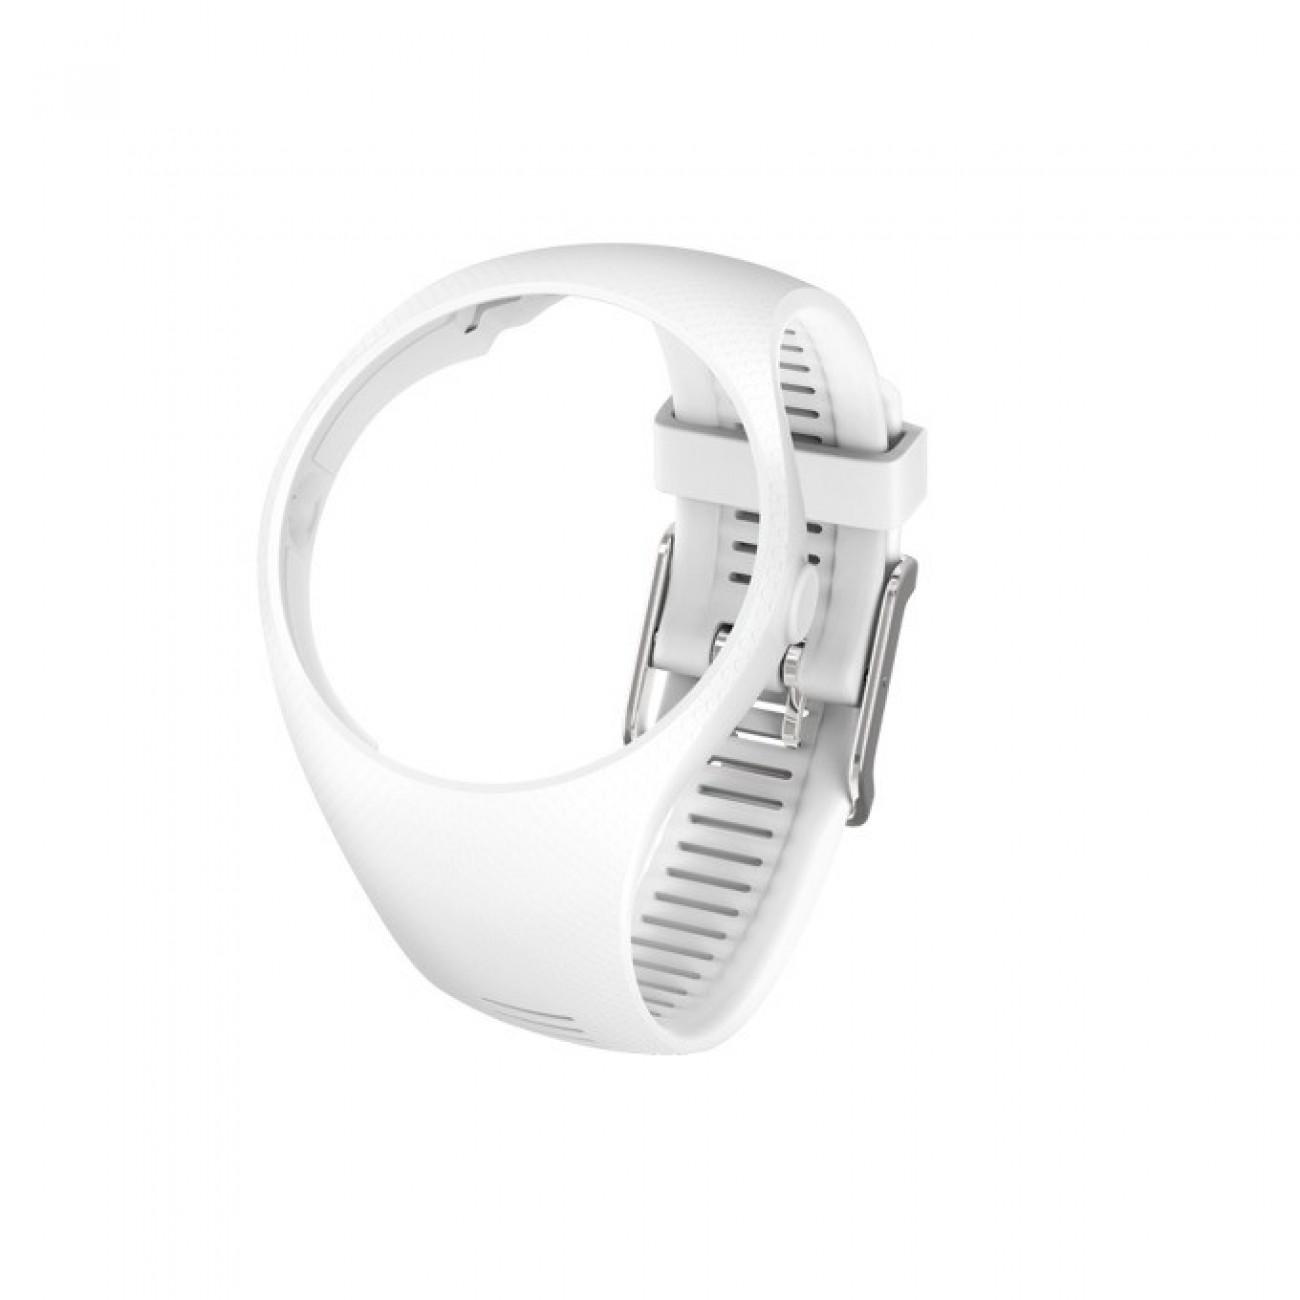 Каишка за смарт часовник Polar M200, размер S/M, бяла в Смарт часовници -  | Alleop